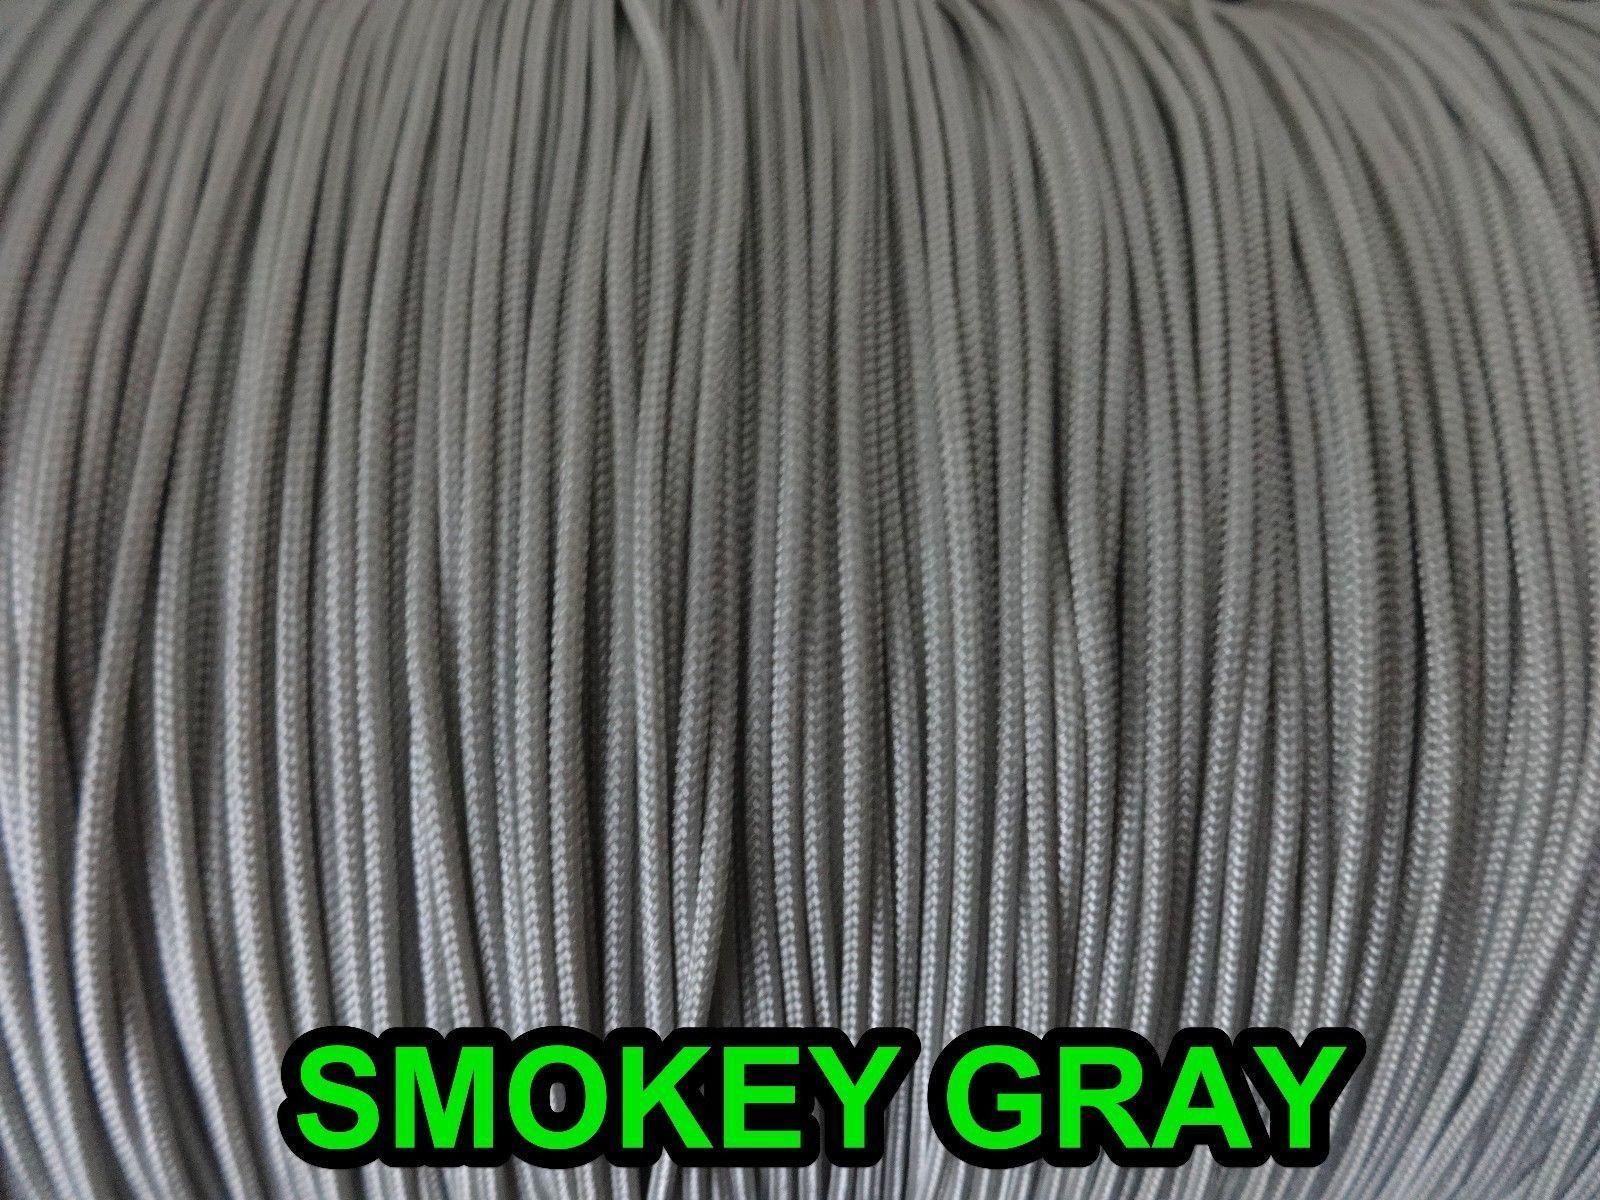 10 YARDS: 1.8mm SMOKEY GRAY LIFT CORD for ROMAN/PLEATED shade &HORIZONTAL blind